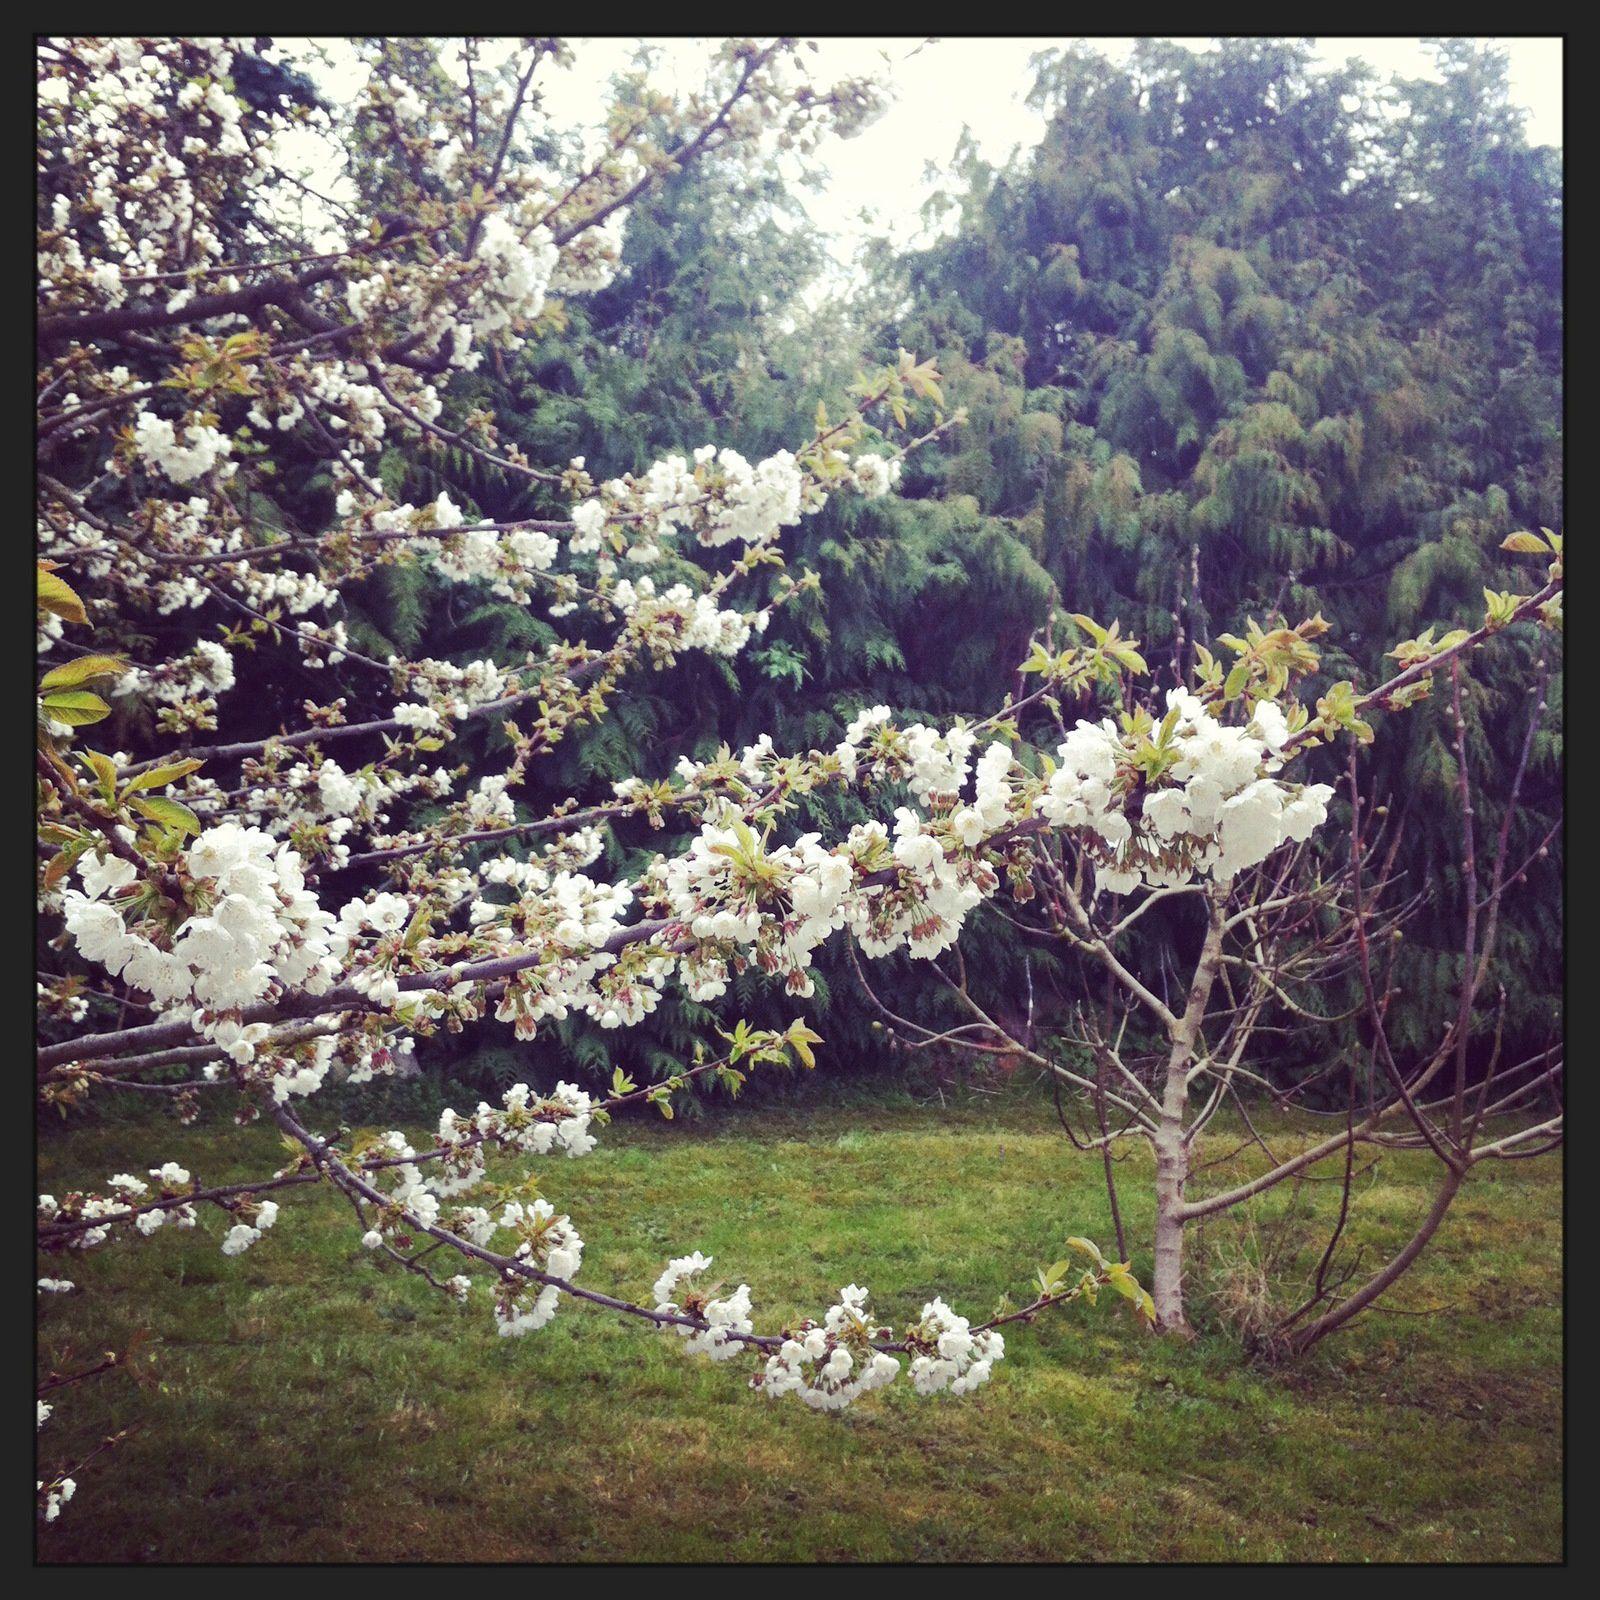 #2014projet52 - #printemps